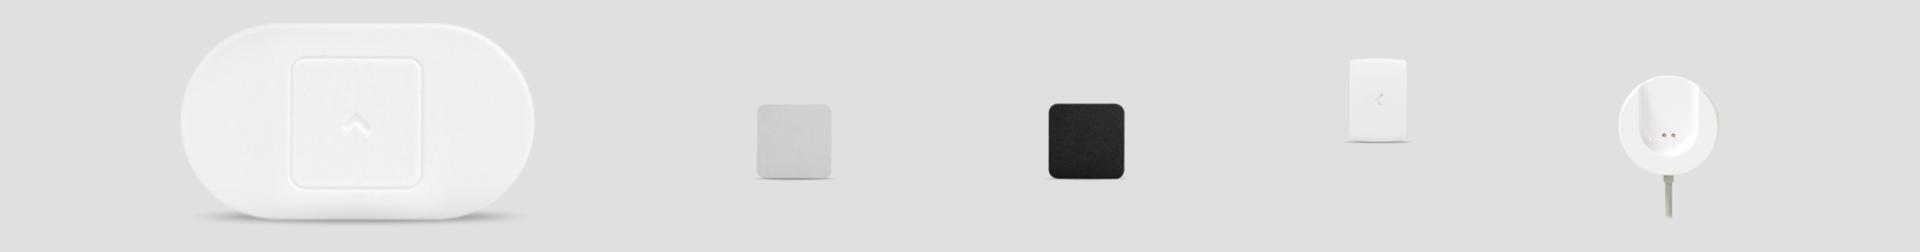 Lumo Lift — электронный корректор осанки для офиса - 11